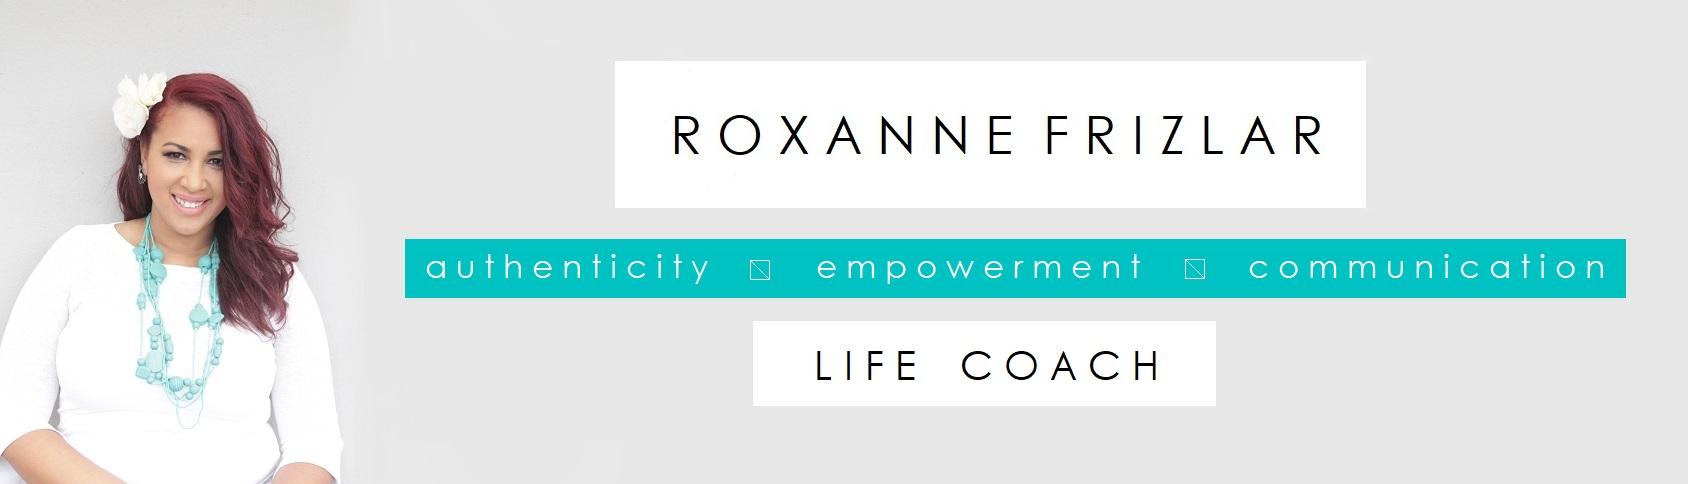 LIFE COACH – ROXANNE FRIZLAR